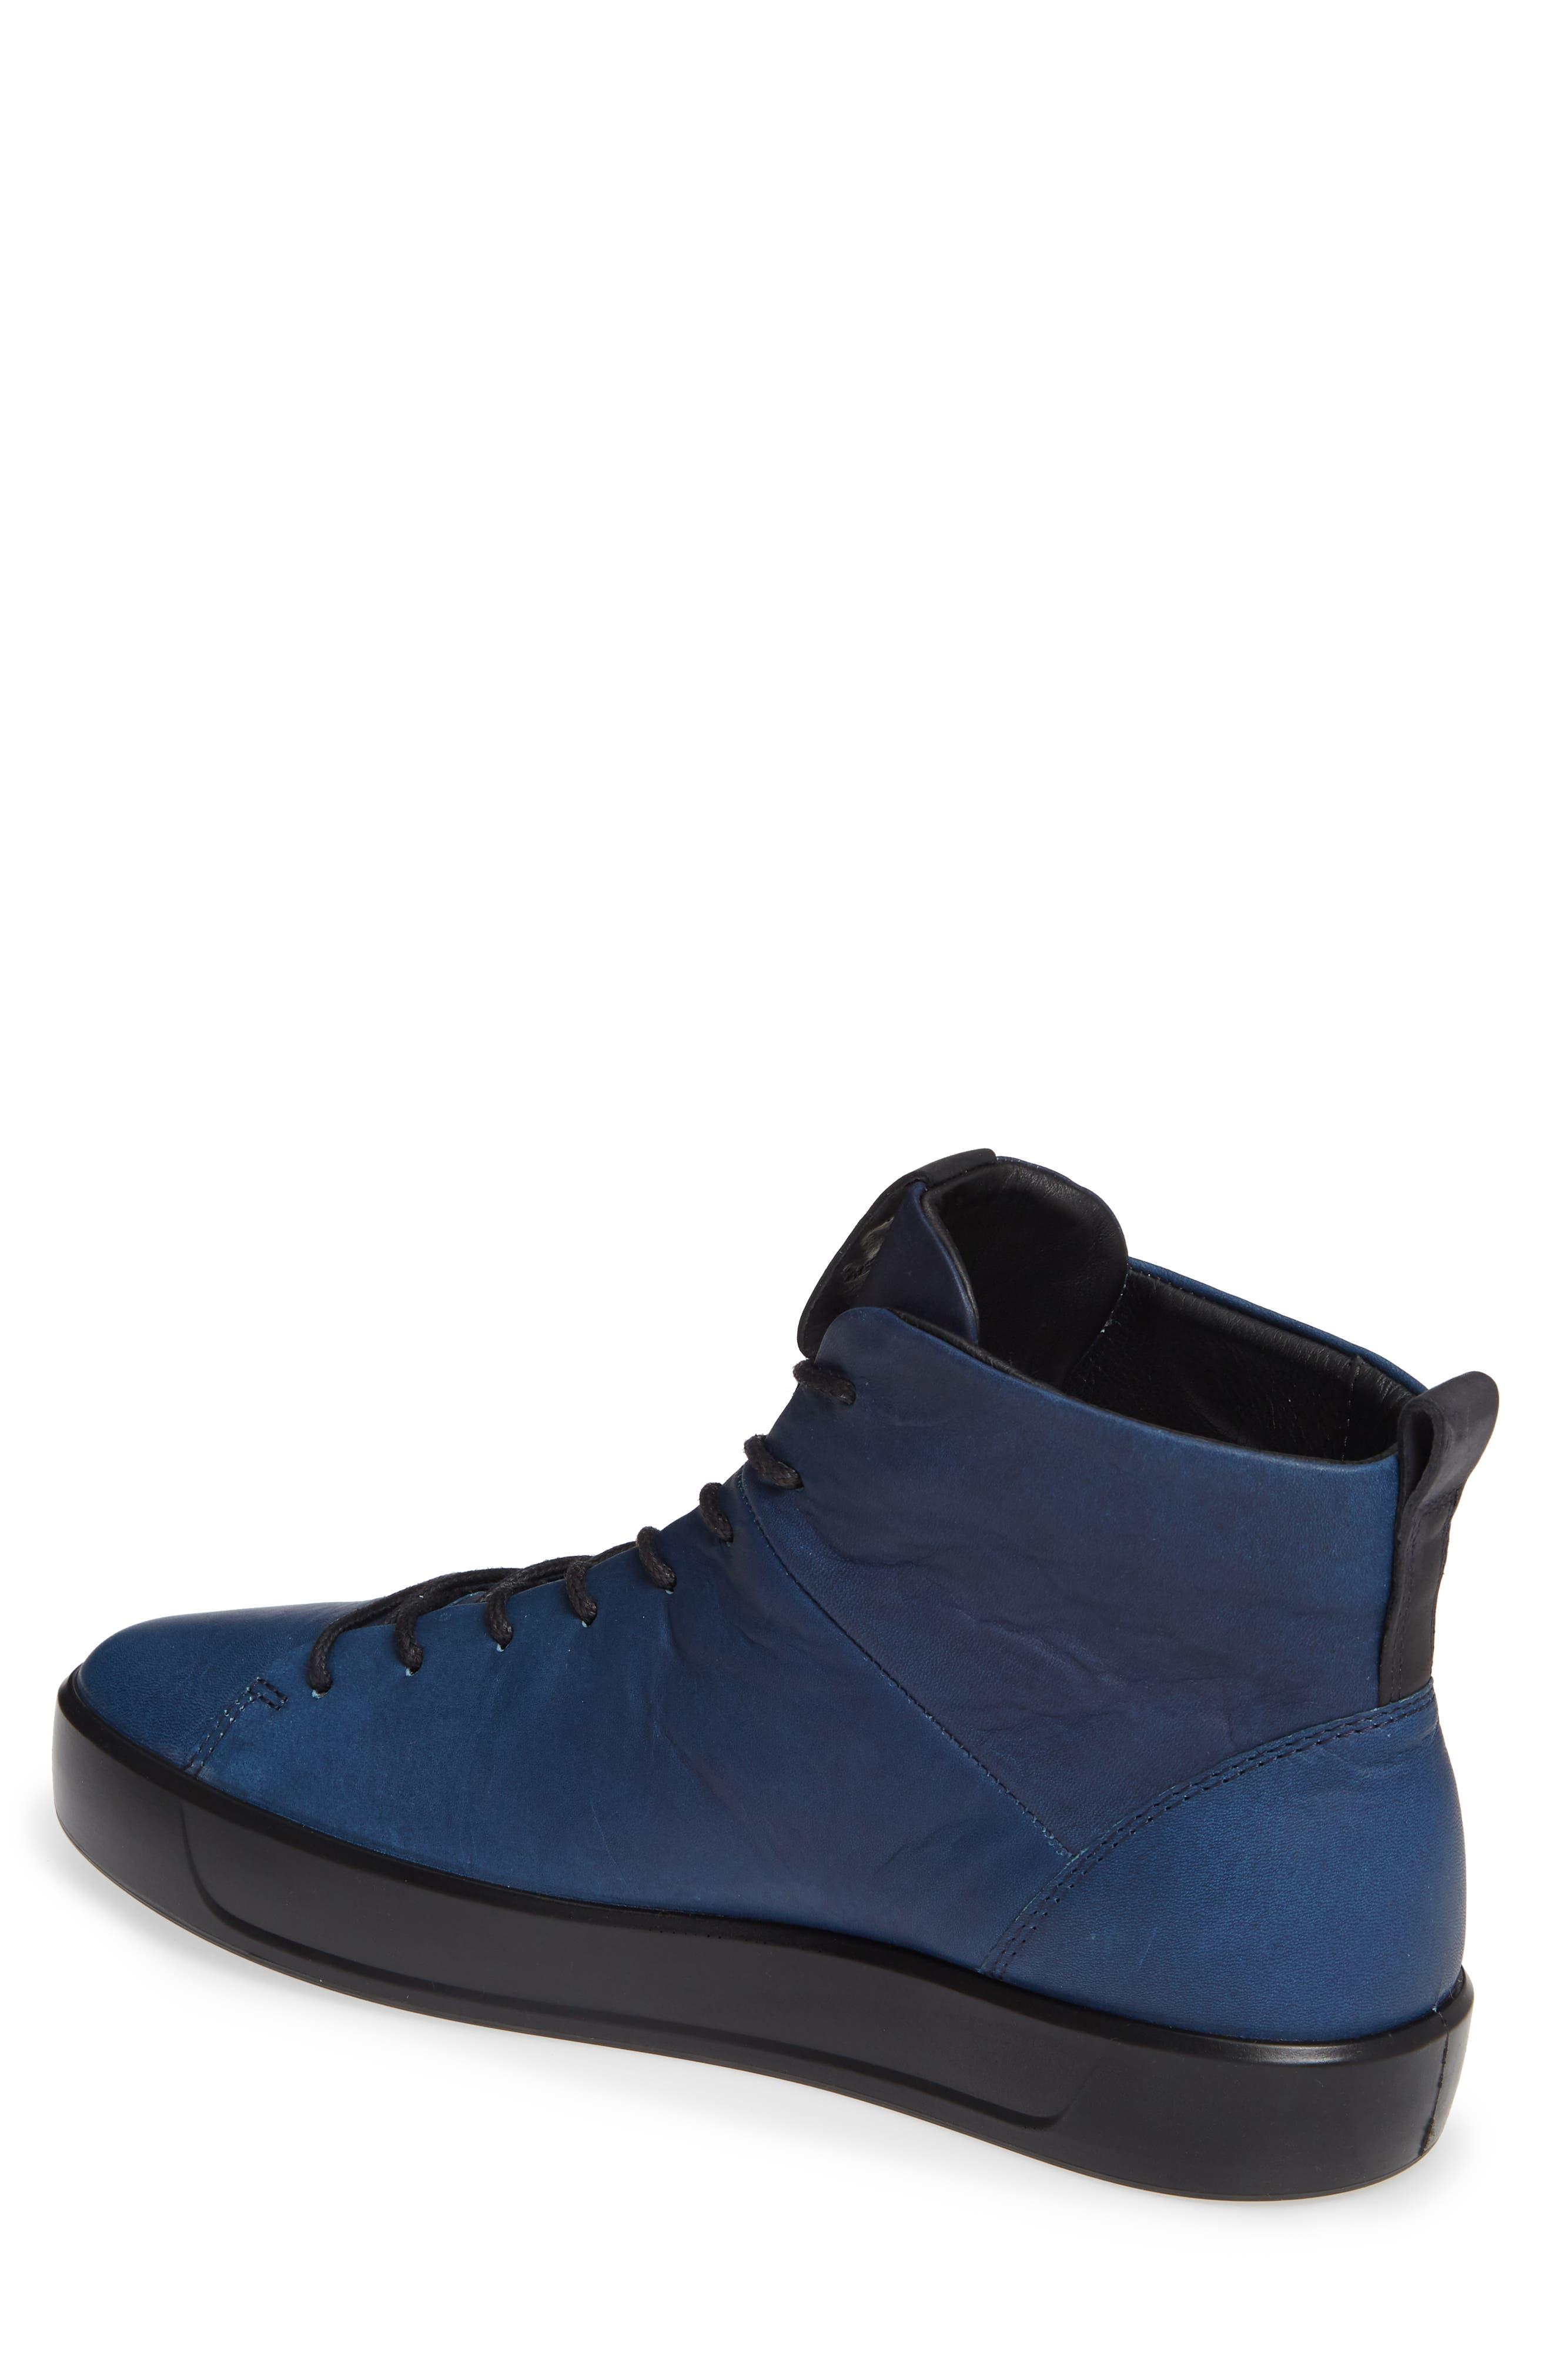 Soft 8 Sneaker,                             Alternate thumbnail 2, color,                             INDIGO LEATHER